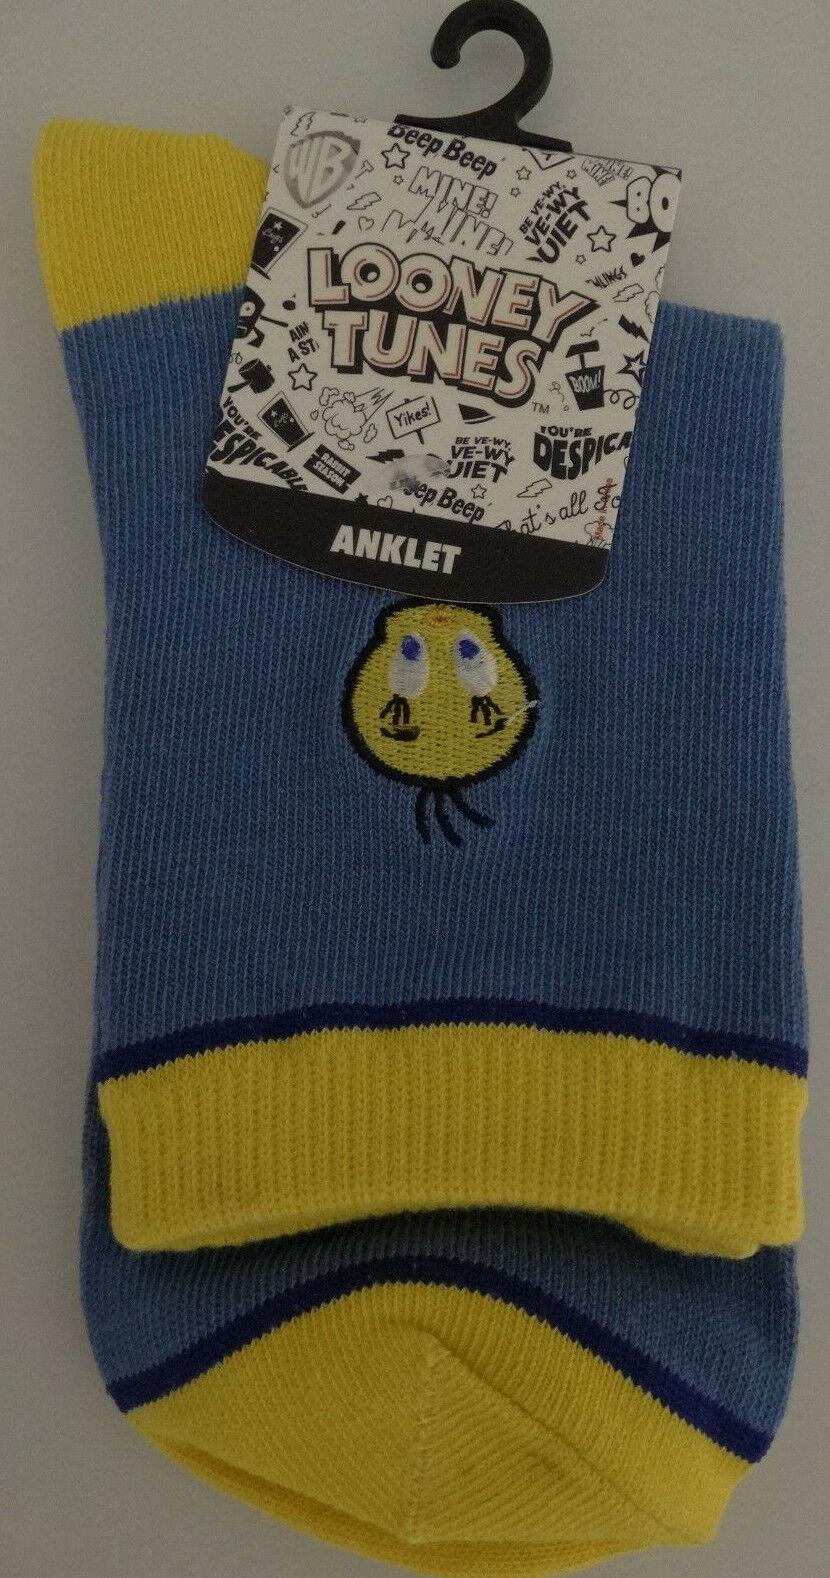 Tweety Bird Looney Tunes Cartoon Bird Embroidered Anklet Ankle Socks